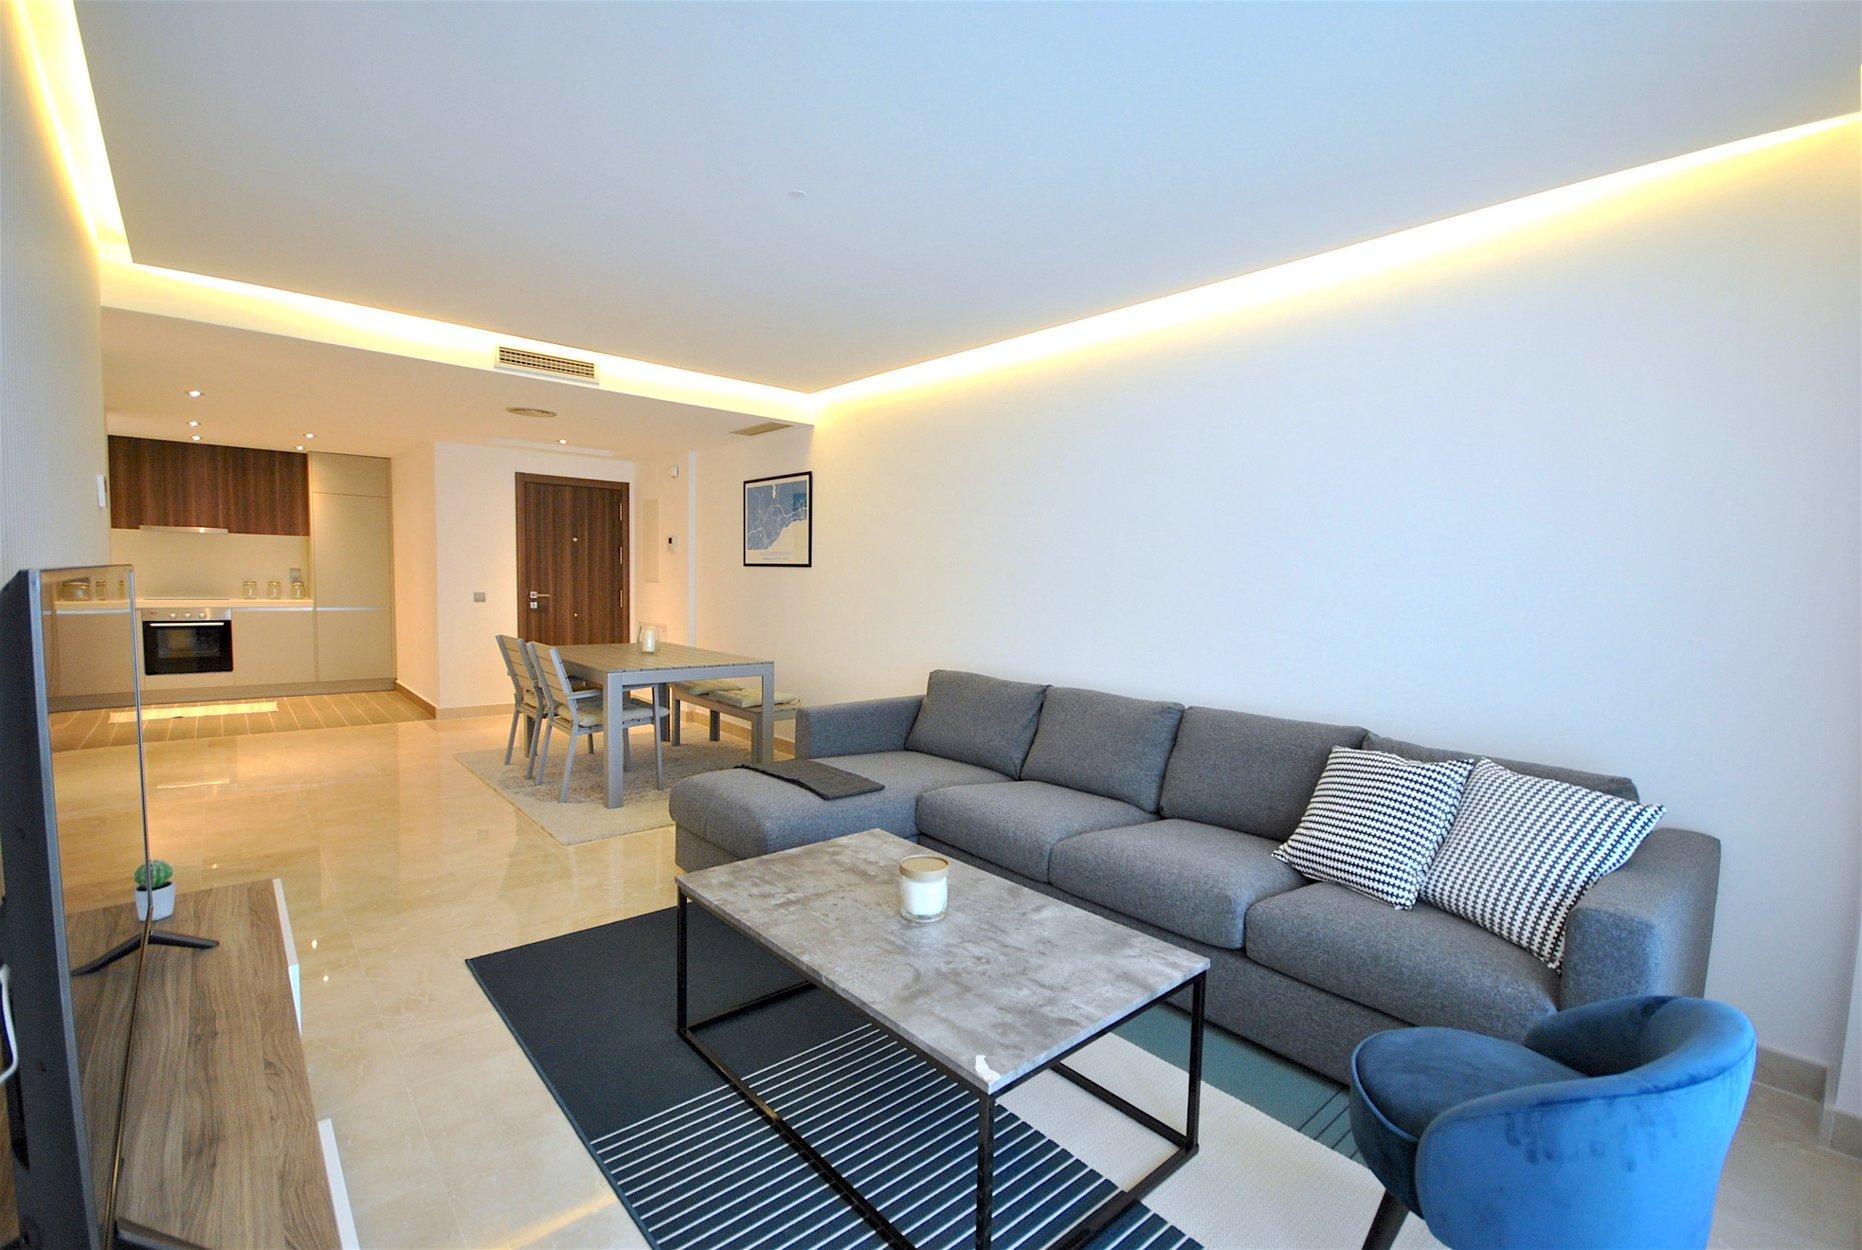 3 bedroom 2 bathroom apartment for sale in san pedro - 3 bedroom and 2 bathrooms apartment ...